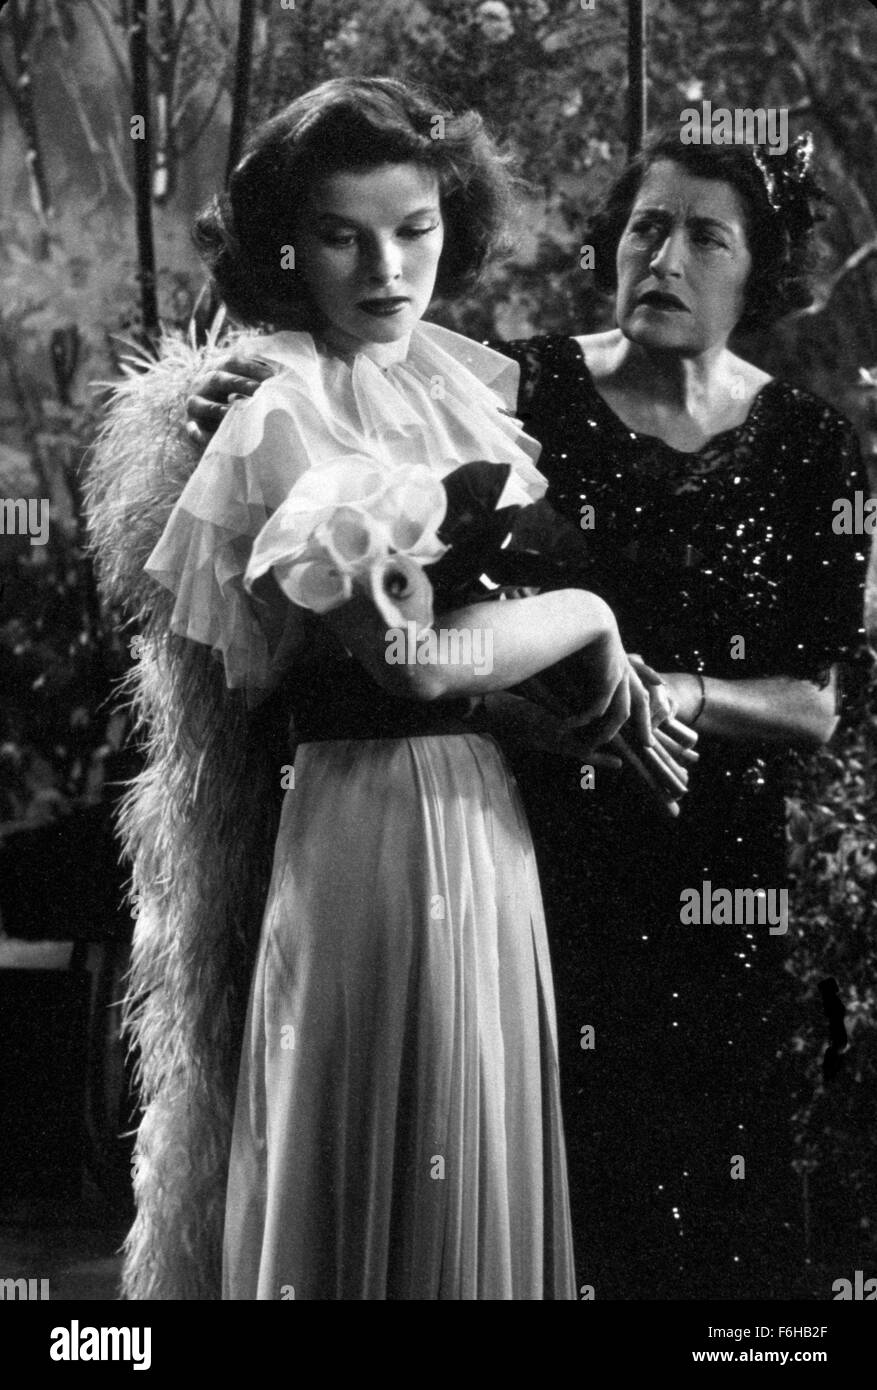 1937 Film Title STAGE DOOR Director GREGORY LA CAVA Studio RKO Pictured CONSTANCE COLLIER KATHARINE HEPBURN FILM STILL DISAPPOINTMENT SAD GLUM ...  sc 1 st  Alamy & 1937 Film Title: STAGE DOOR Director: GREGORY LA CAVA Studio: RKO ...